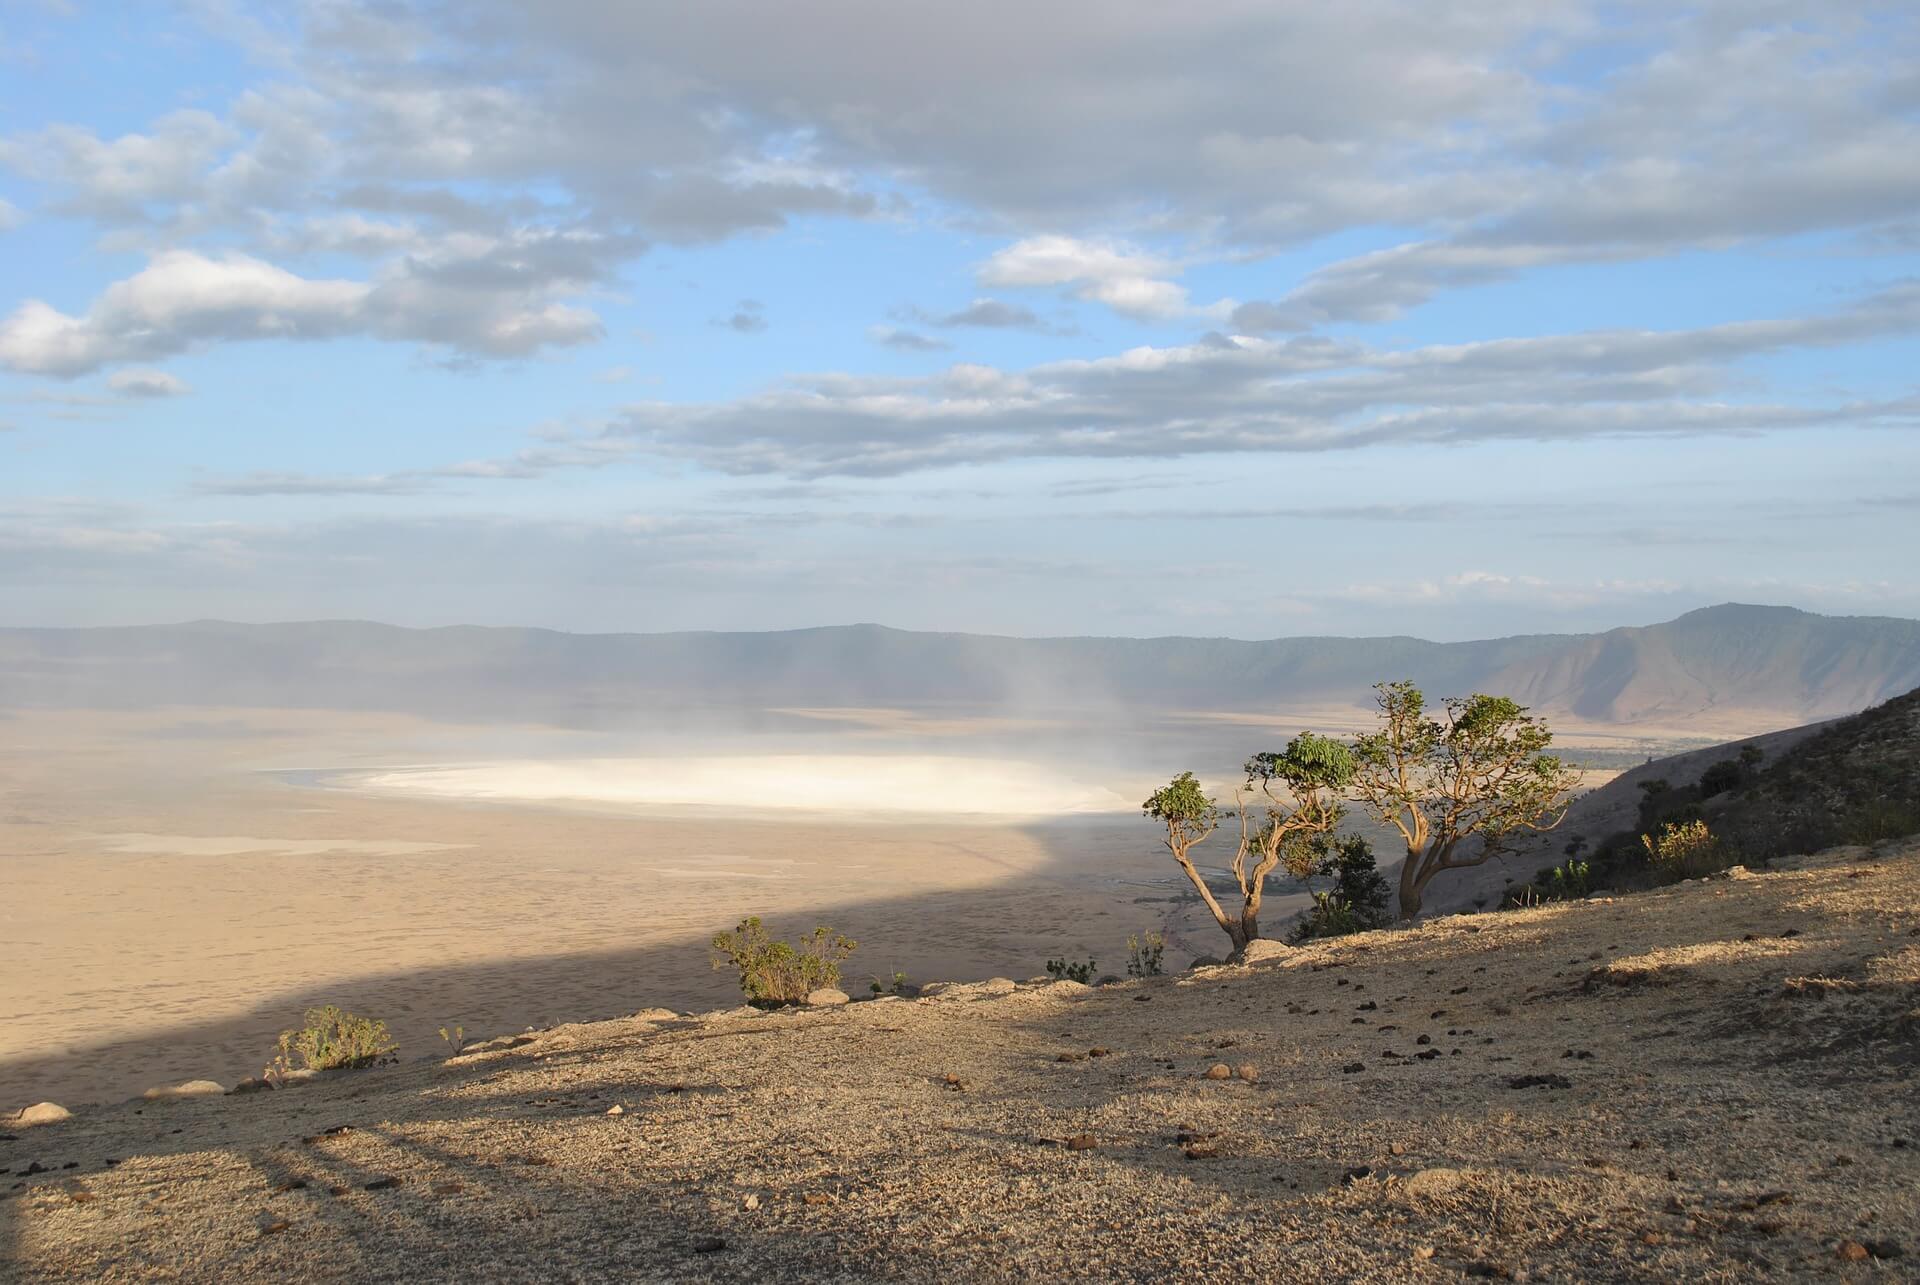 Serengeti Tanzania Africa Revealed